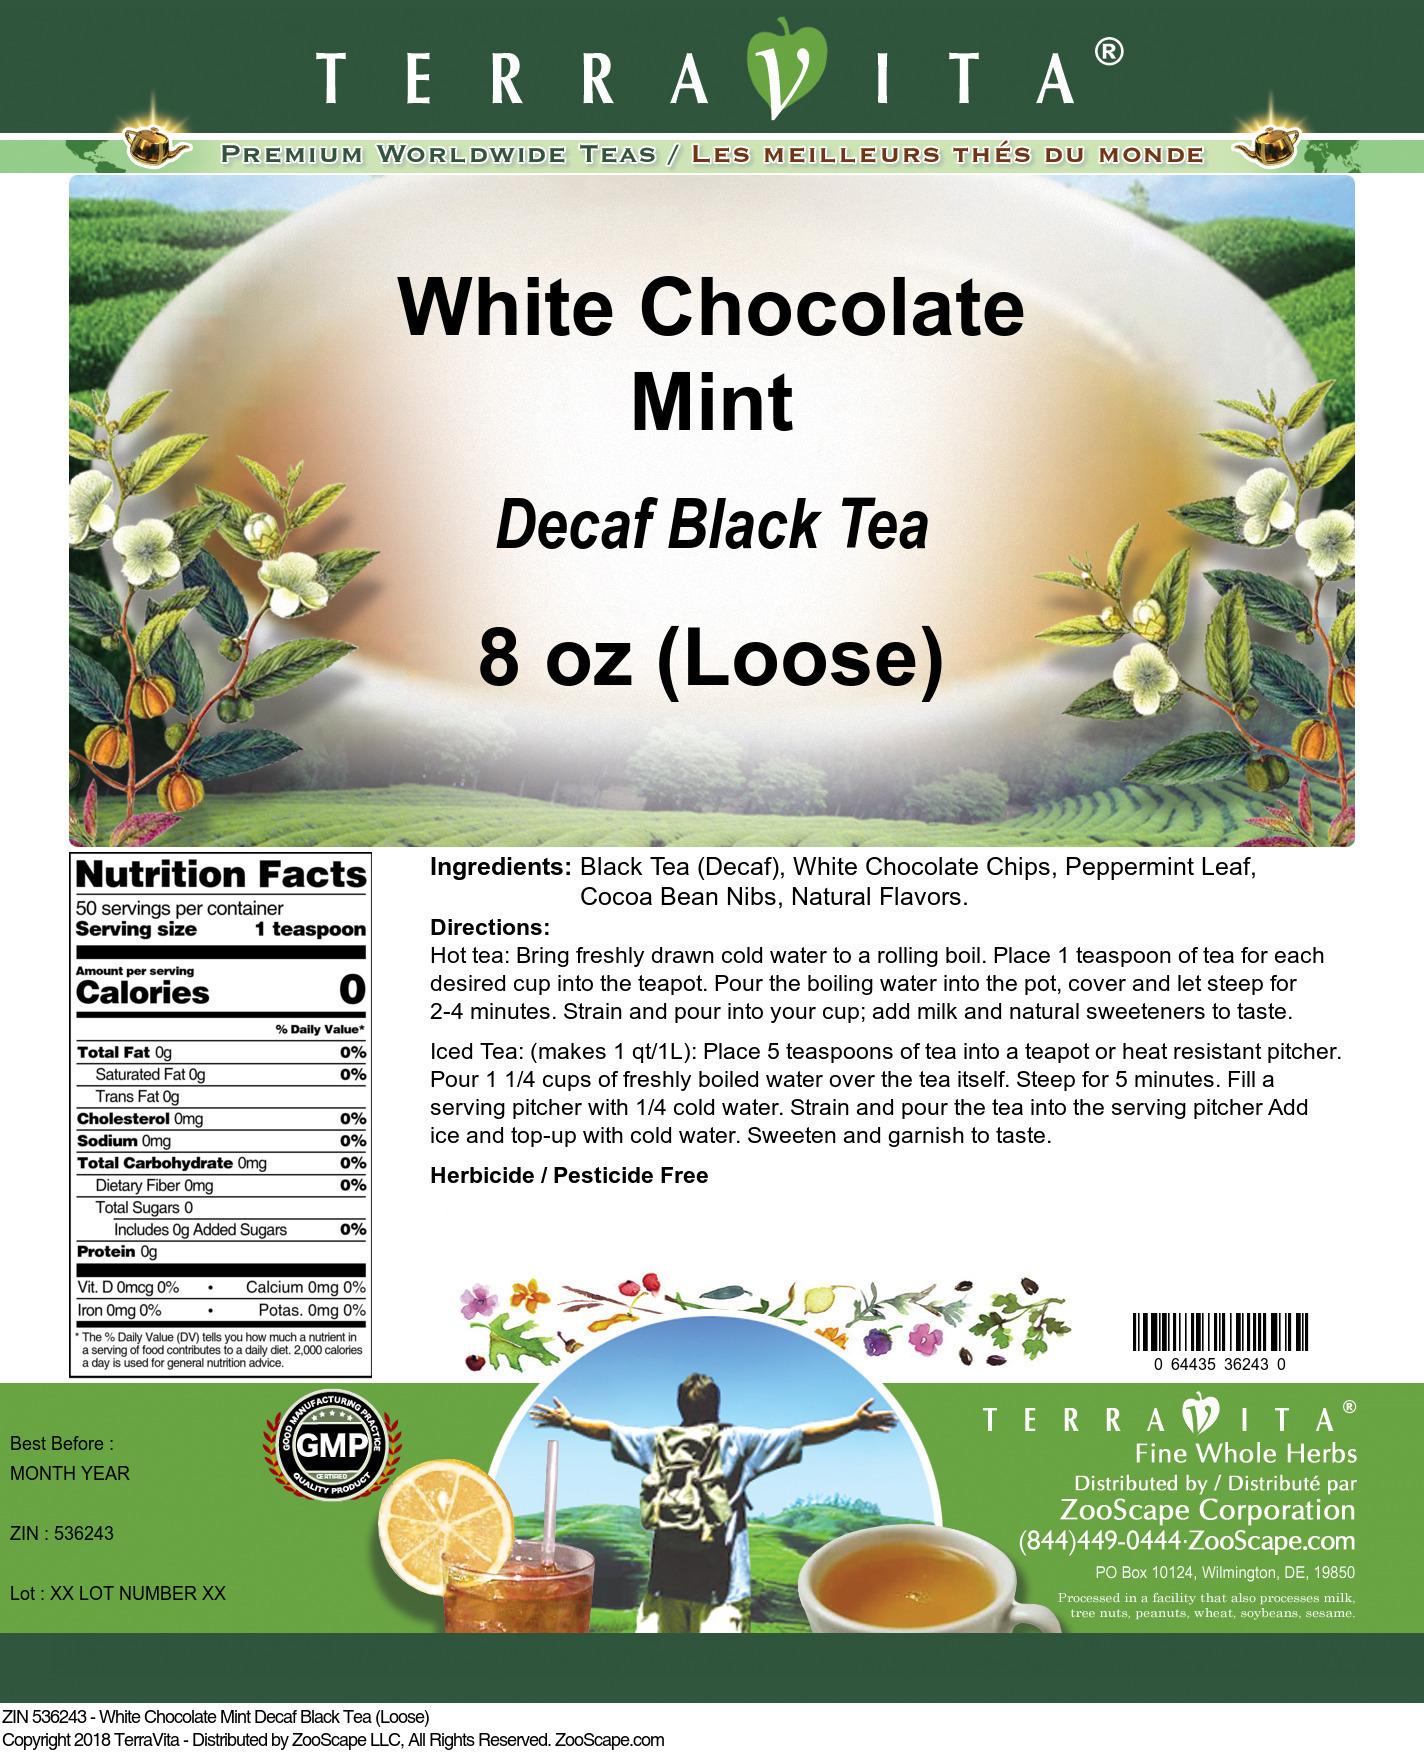 White Chocolate Mint Decaf Black Tea